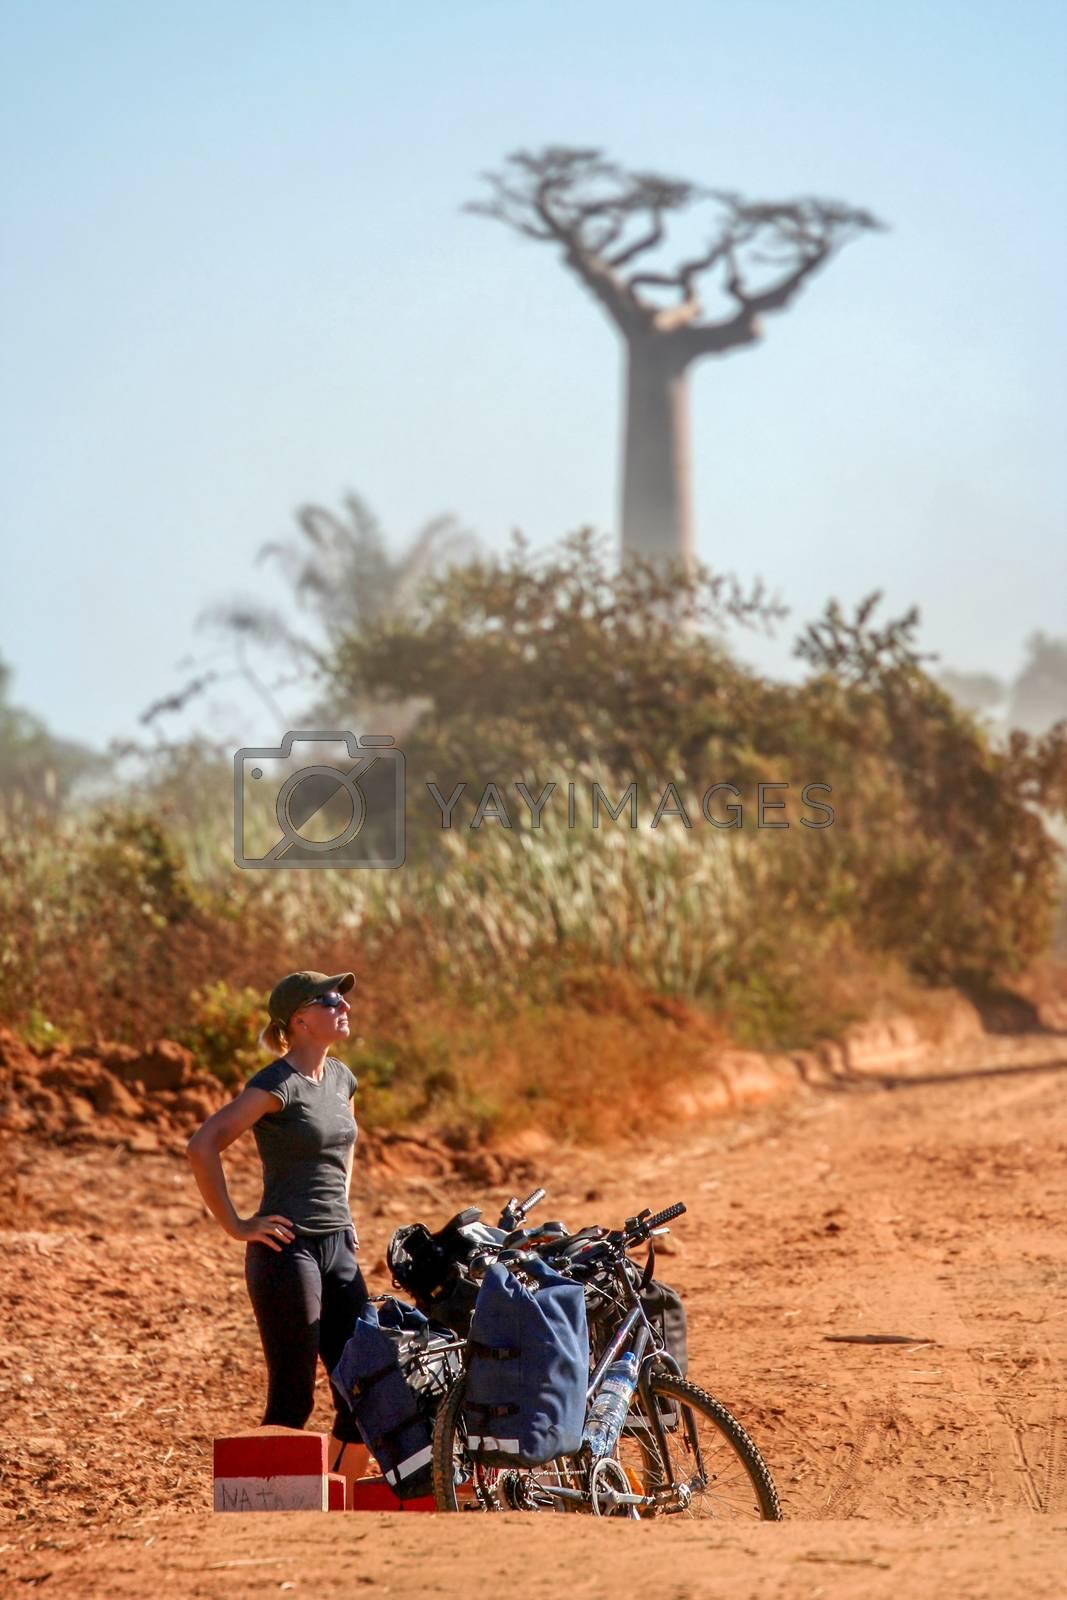 Cyclist resting in the famous Avenida de Baobab near Morondava in Madagascar